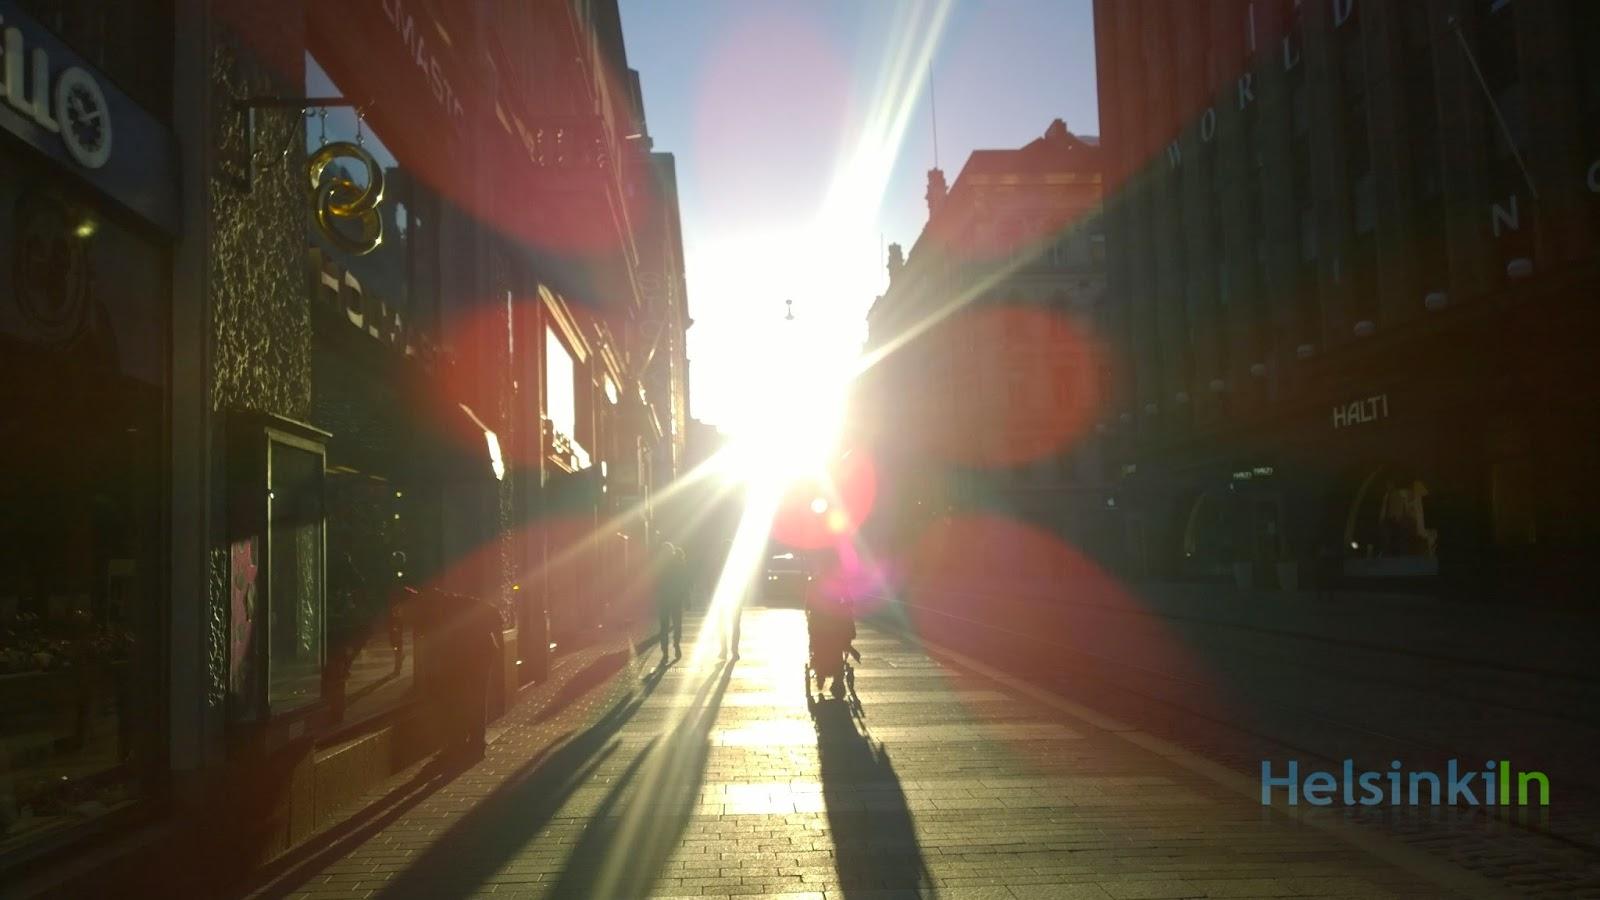 Sun in Aleksanterinkatu